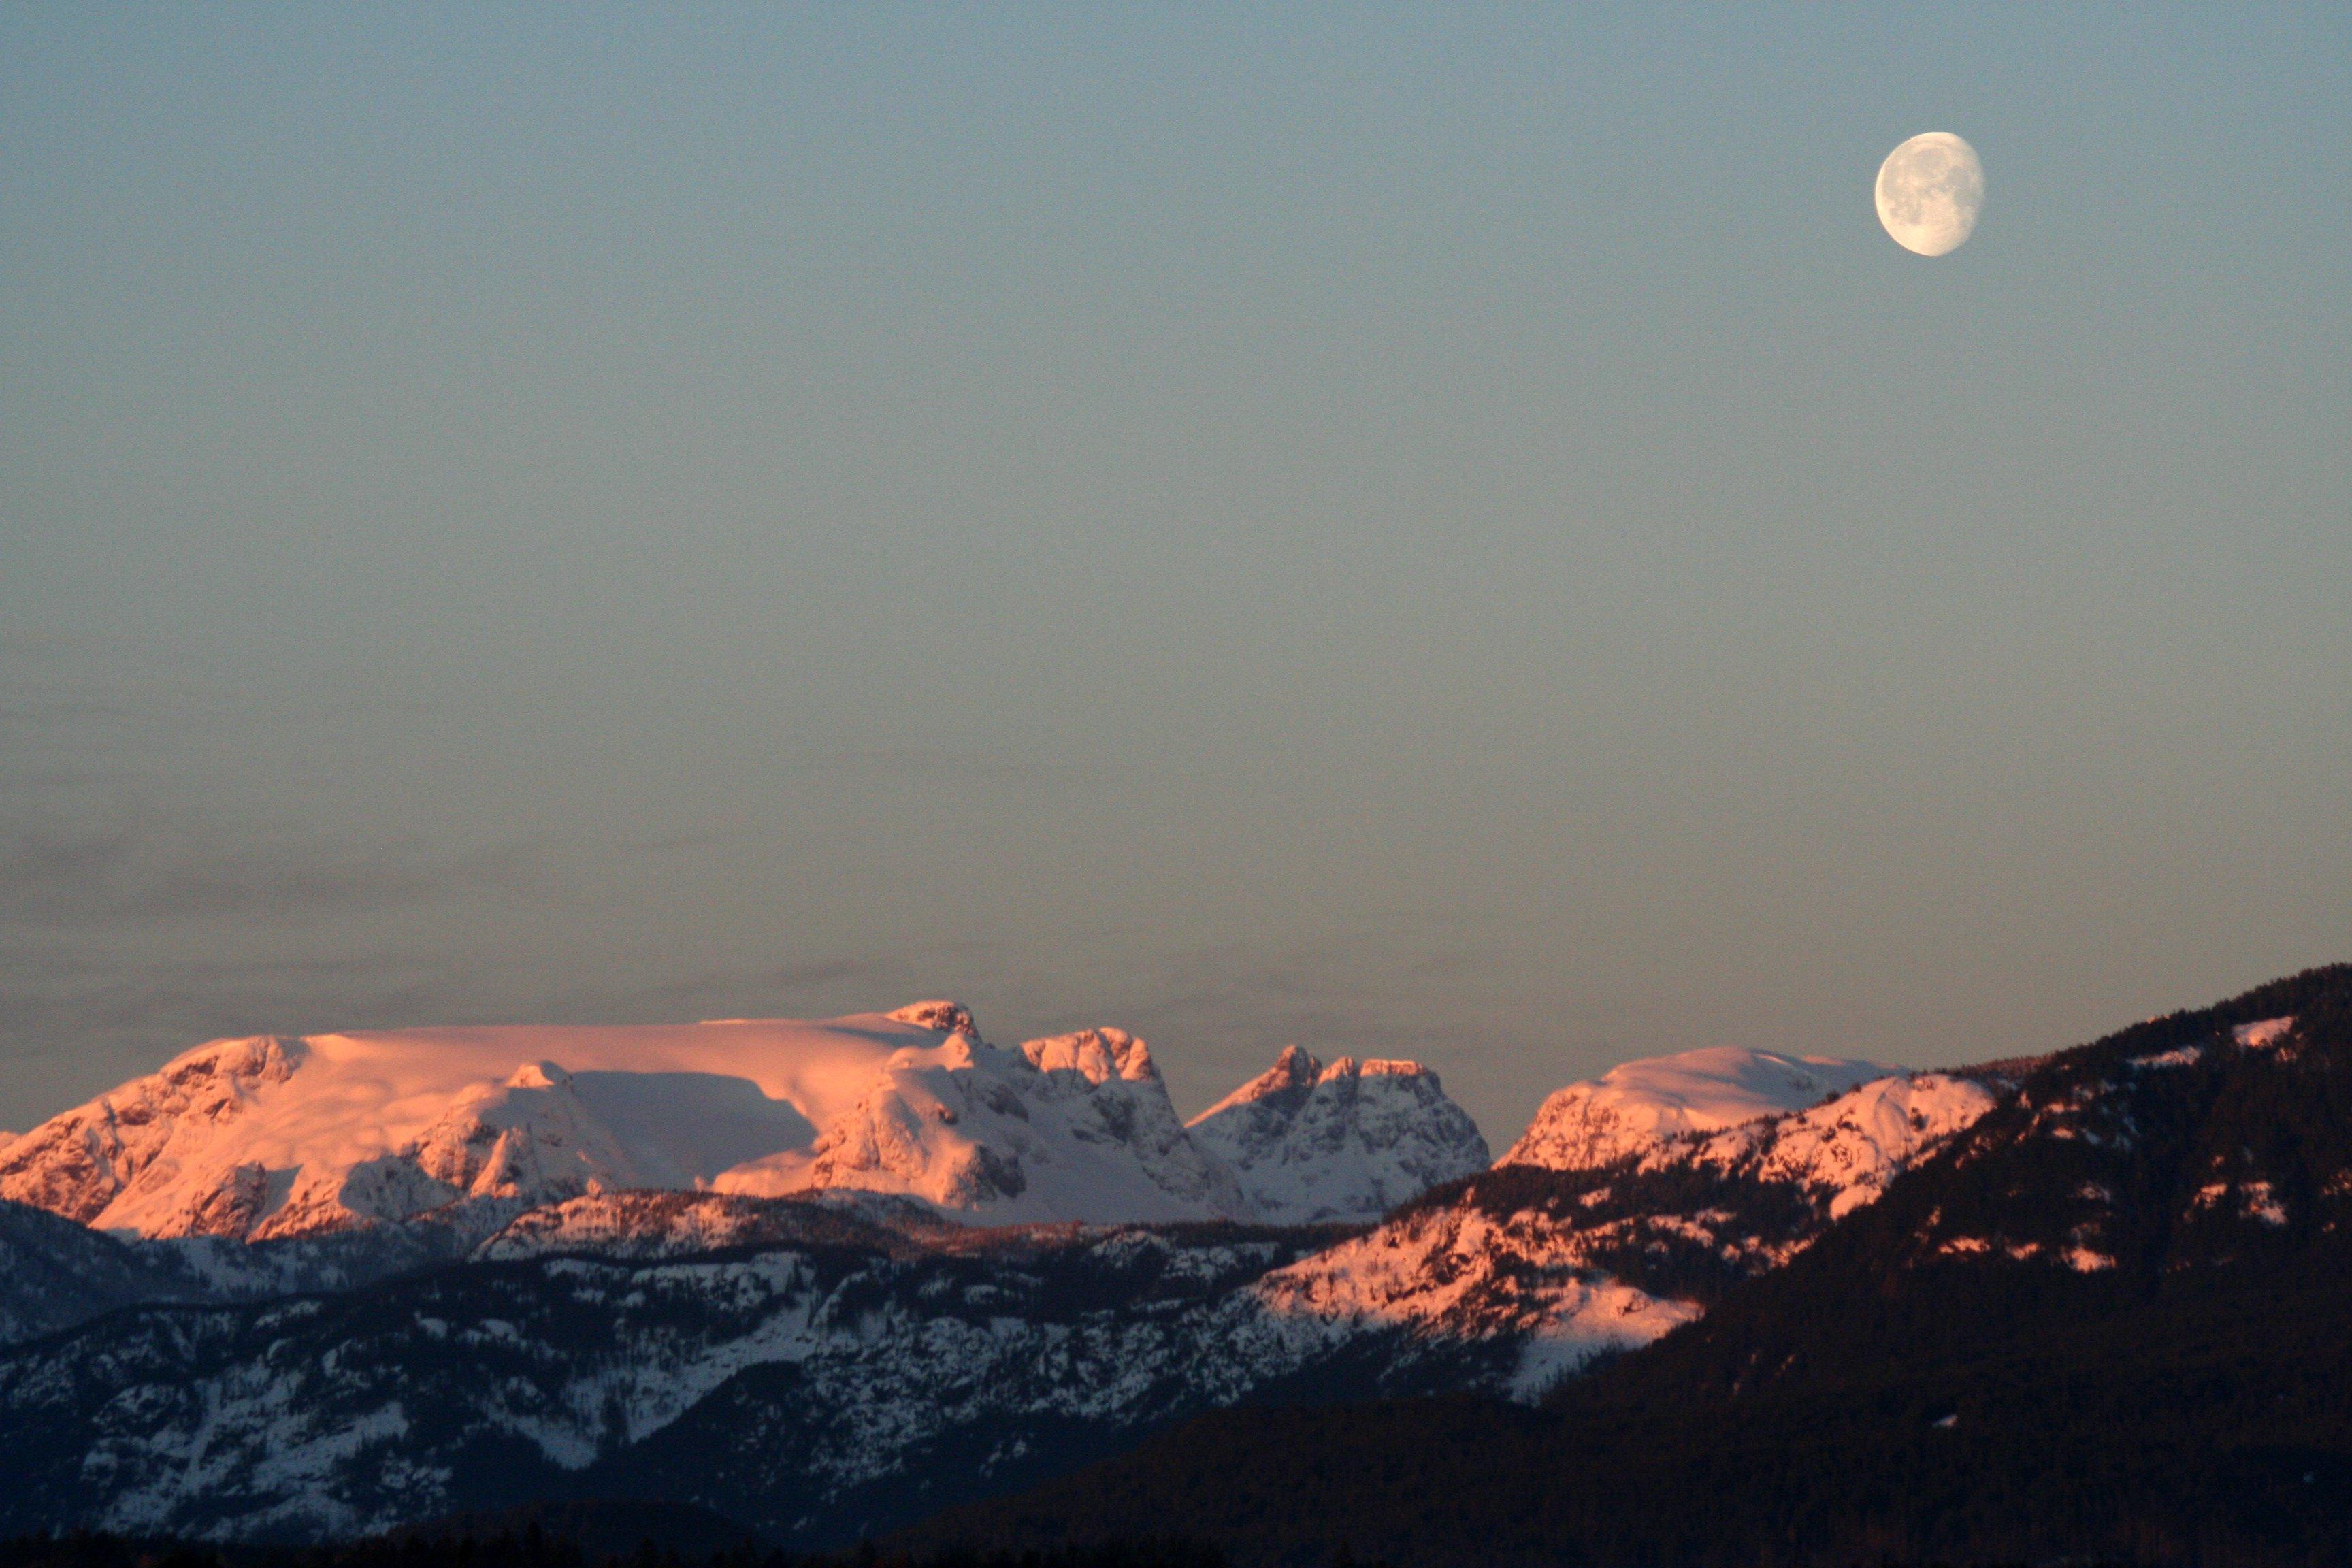 https://i1.wp.com/upload.wikimedia.org/wikipedia/commons/6/66/Comox_Glacier_on_a_February_Morning.jpg?ssl=1